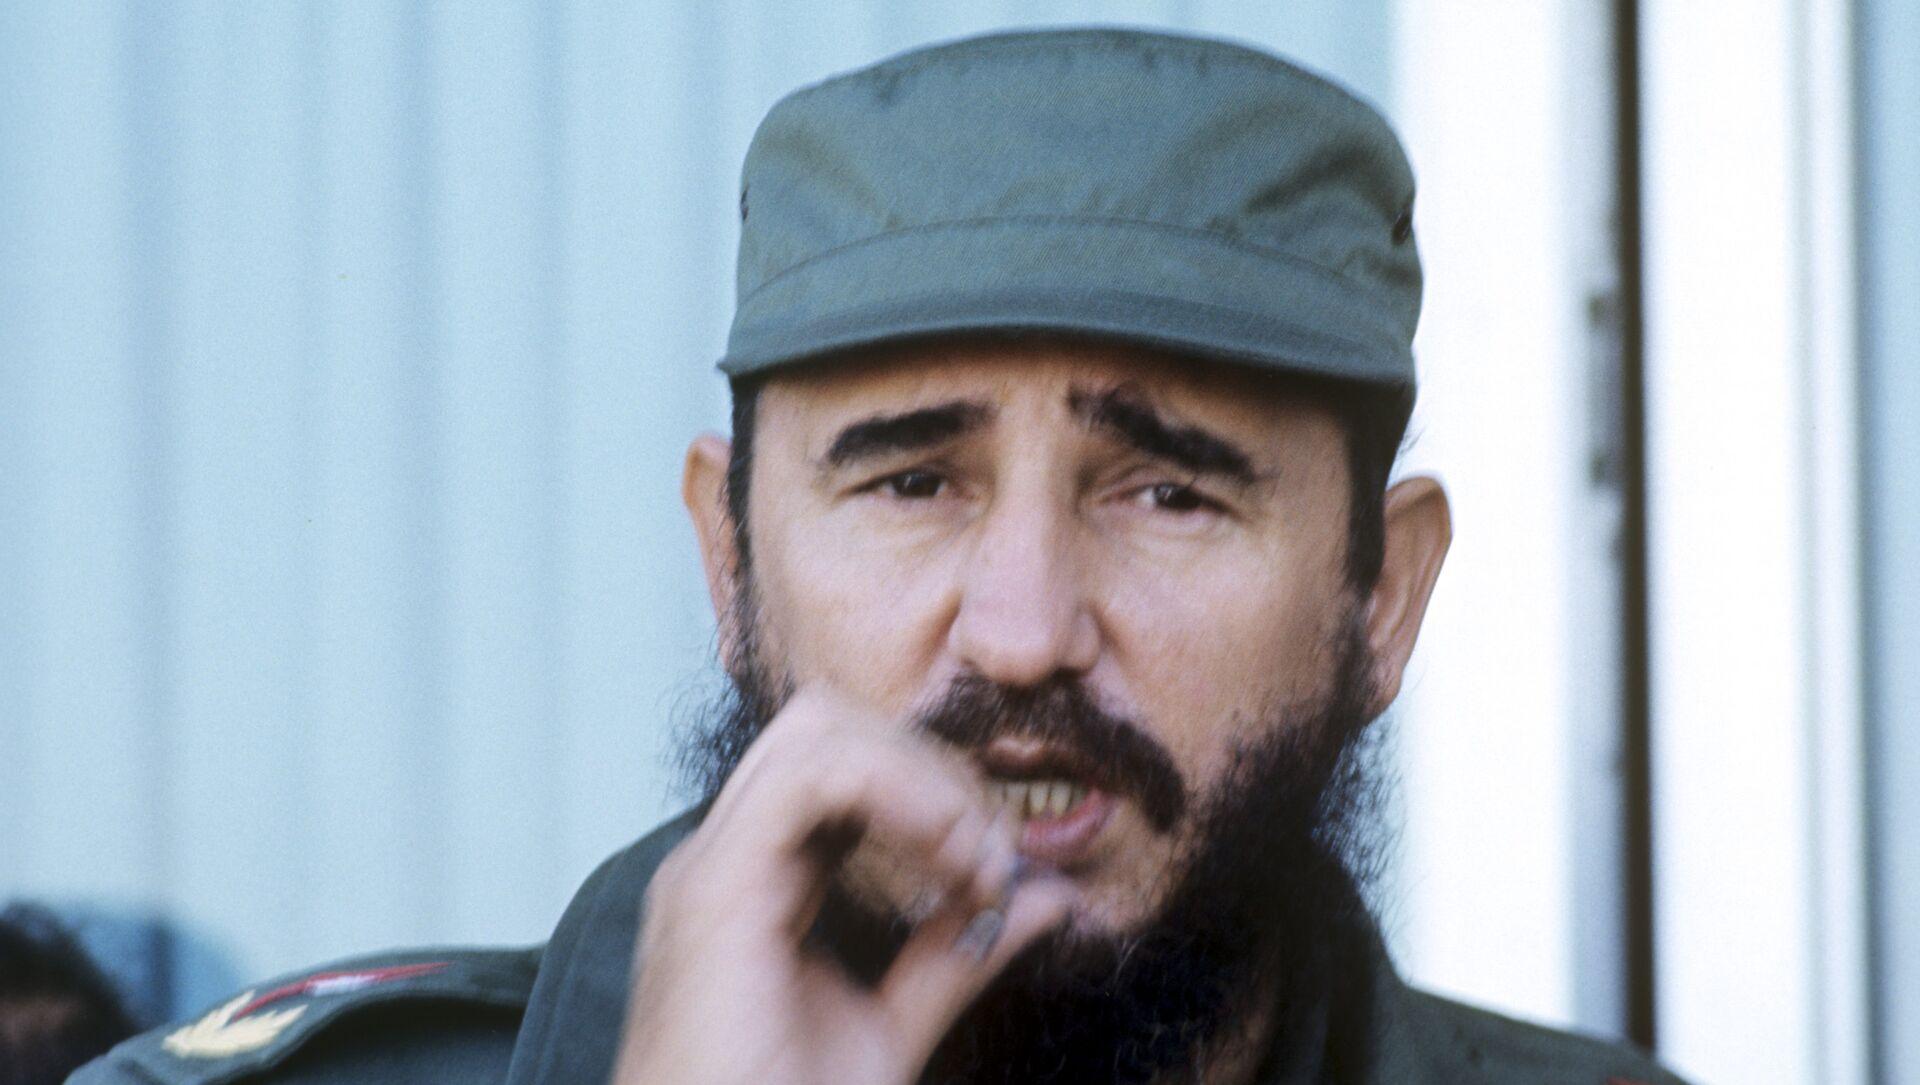 Fidel Castro, líder histórico de la Revolución cubana (archivo) - Sputnik Mundo, 1920, 13.08.2018